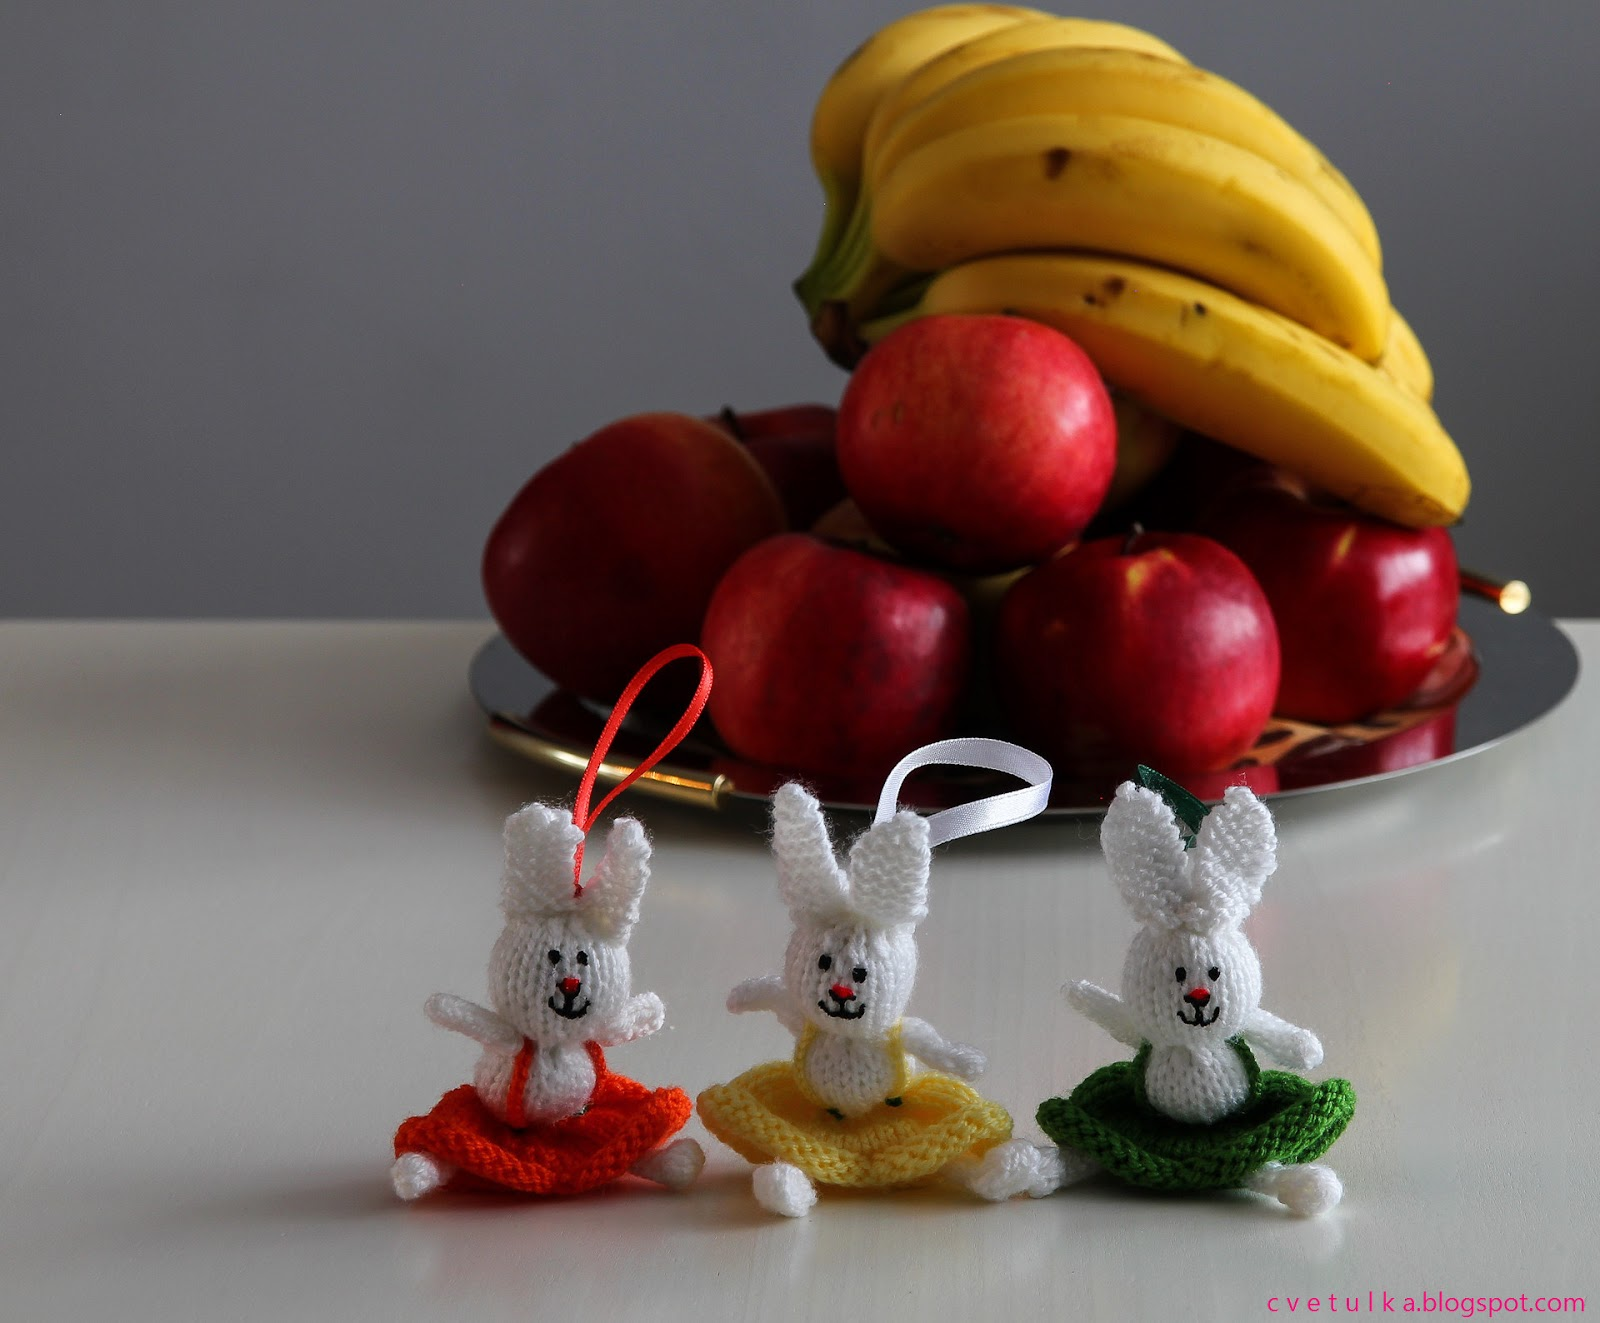 Knitting Easter Bunnies : Knit easter bunny c v e t u l k a knits